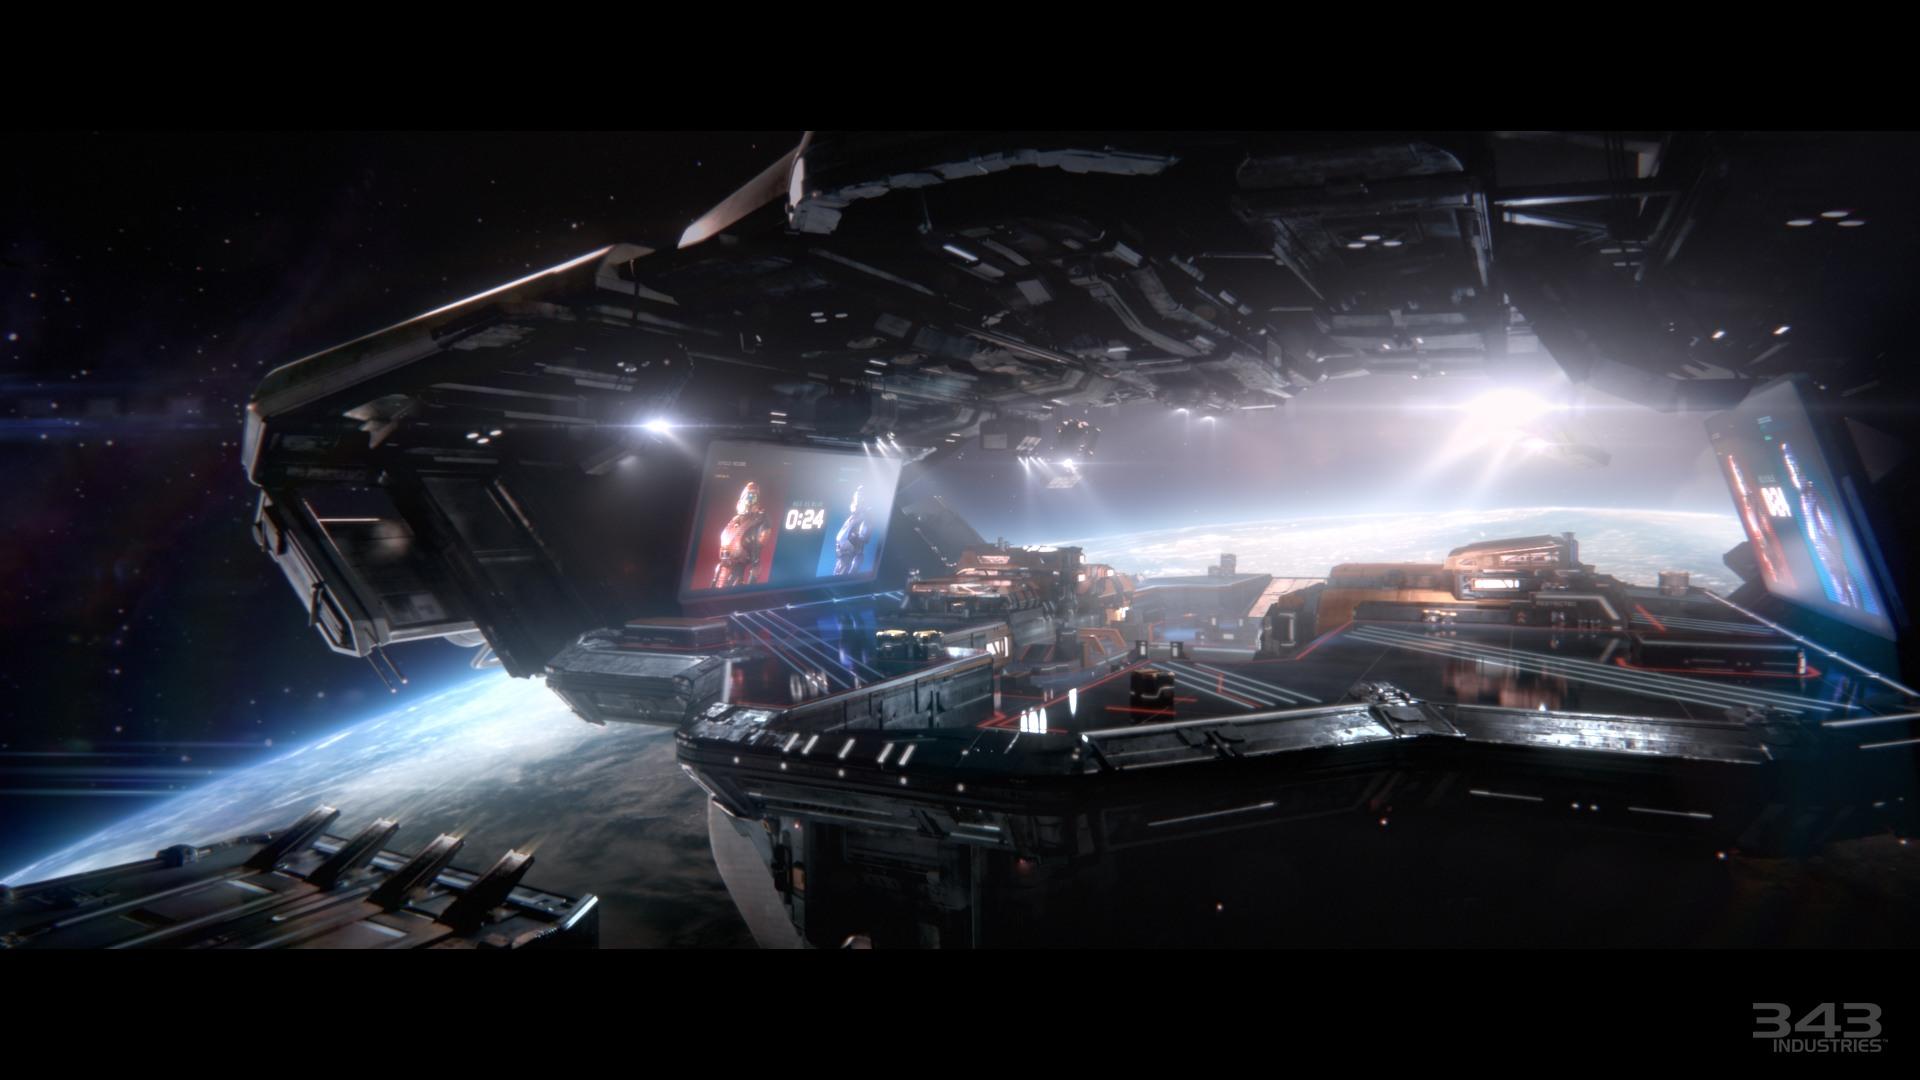 E3 2014 Halo The Master Chief Collection Halo 5 Beta Announced for 1920x1080